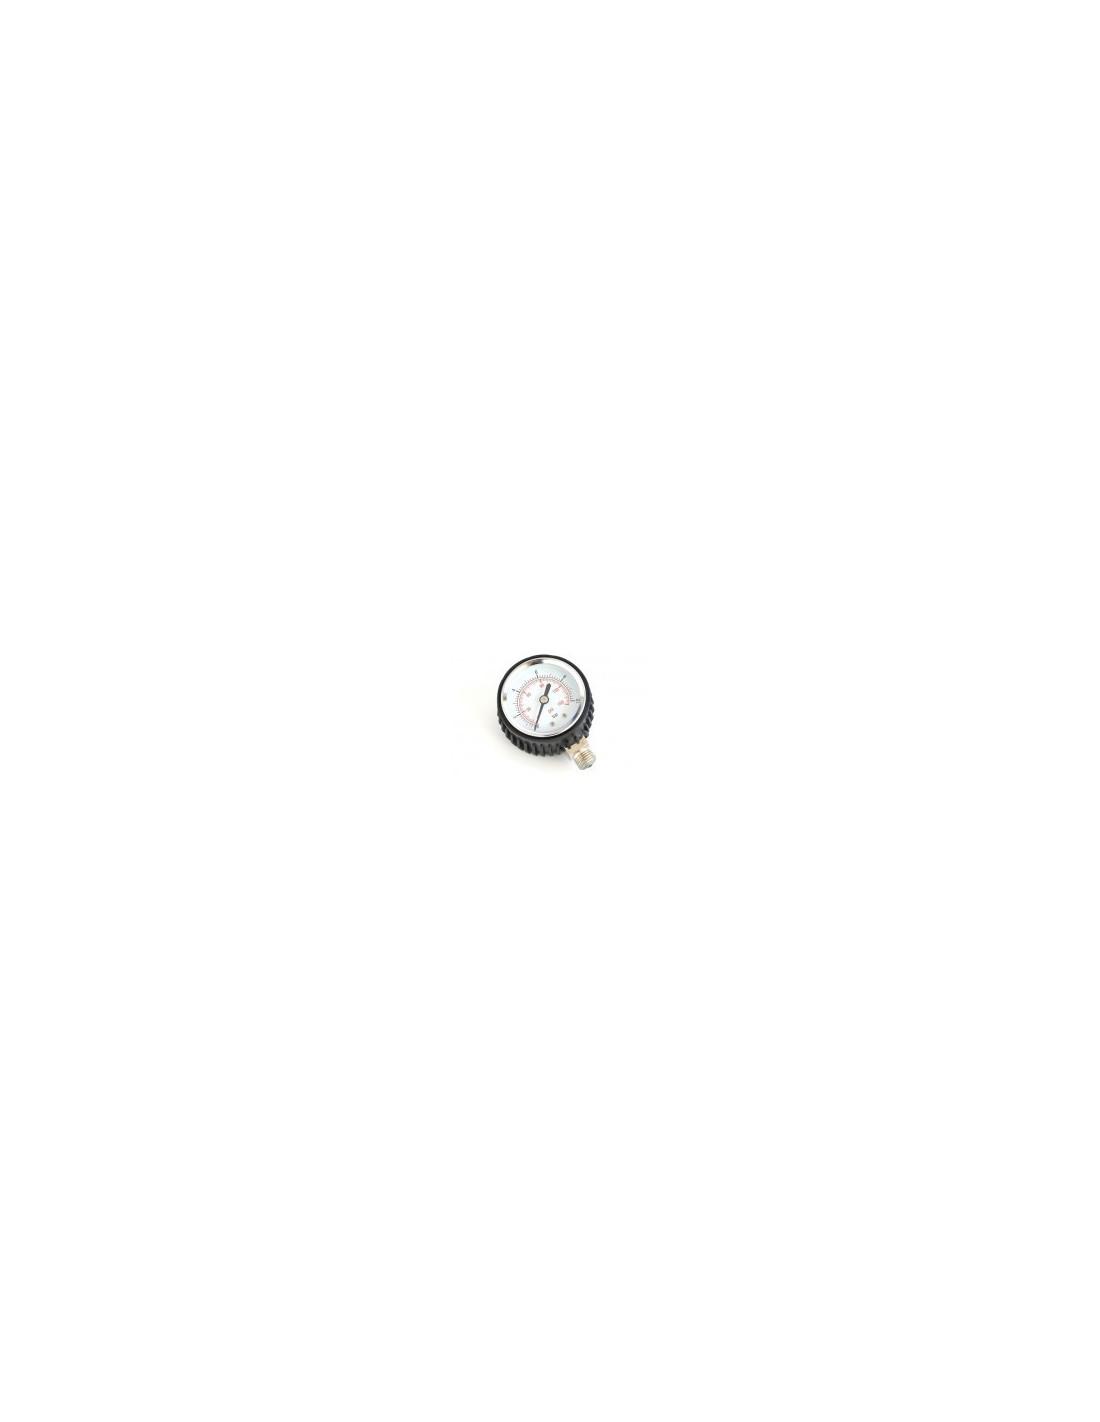 RED01159 - Manometer CO2 work pressure